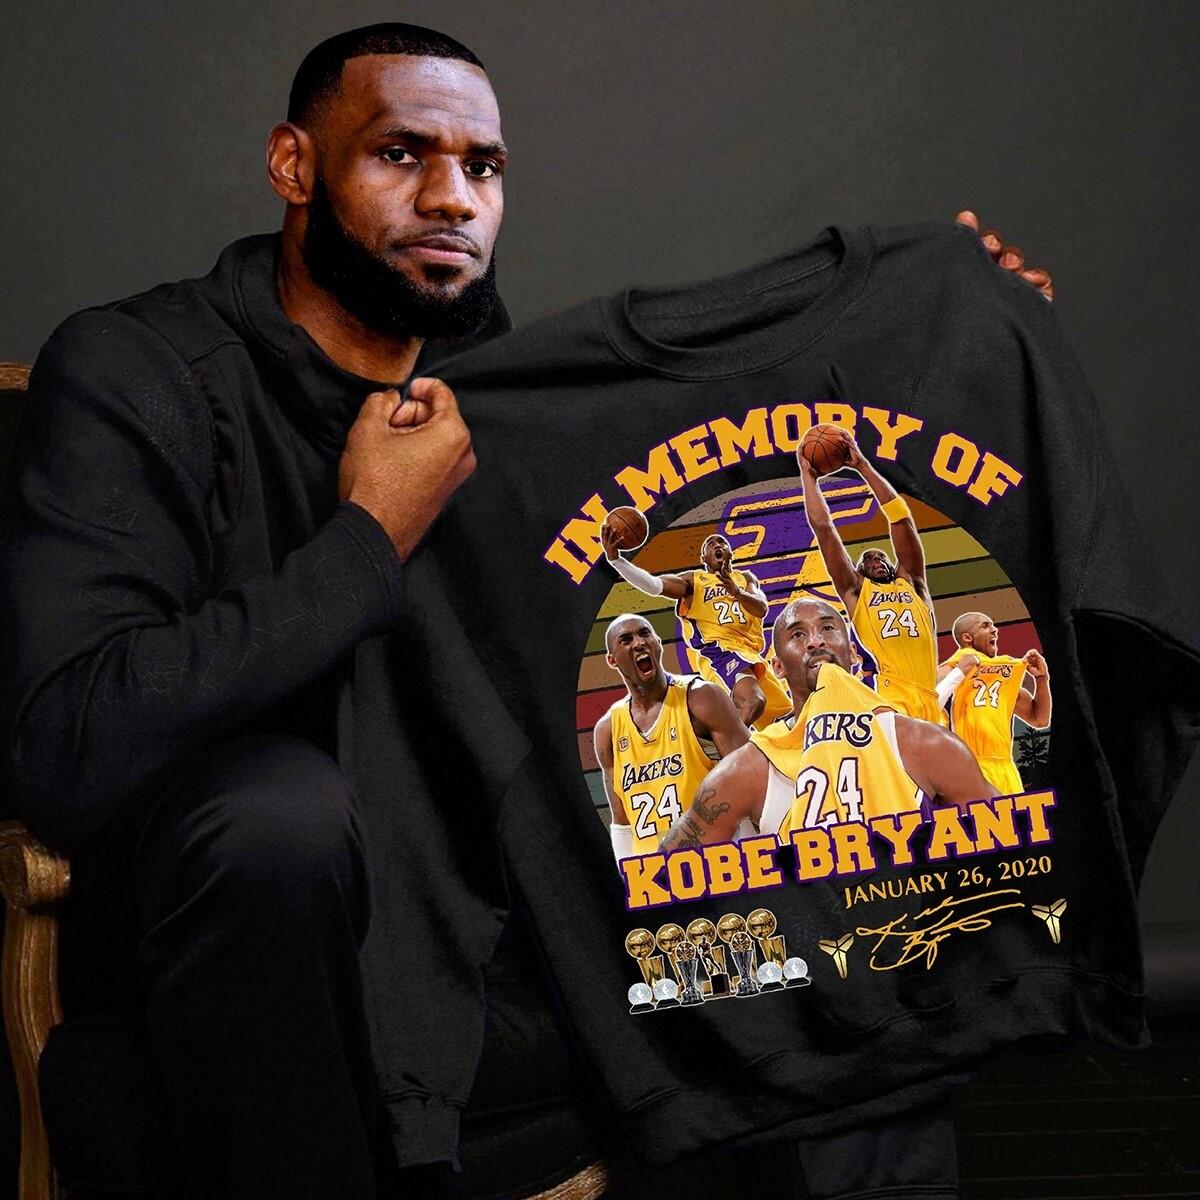 Vintage Retro In Memory Of Kobe Bryant January 26 2020 Signature T-shirt, Hoodie, Sweatshirt, Long Sleeve, Ladies T-shirt, Young Tee